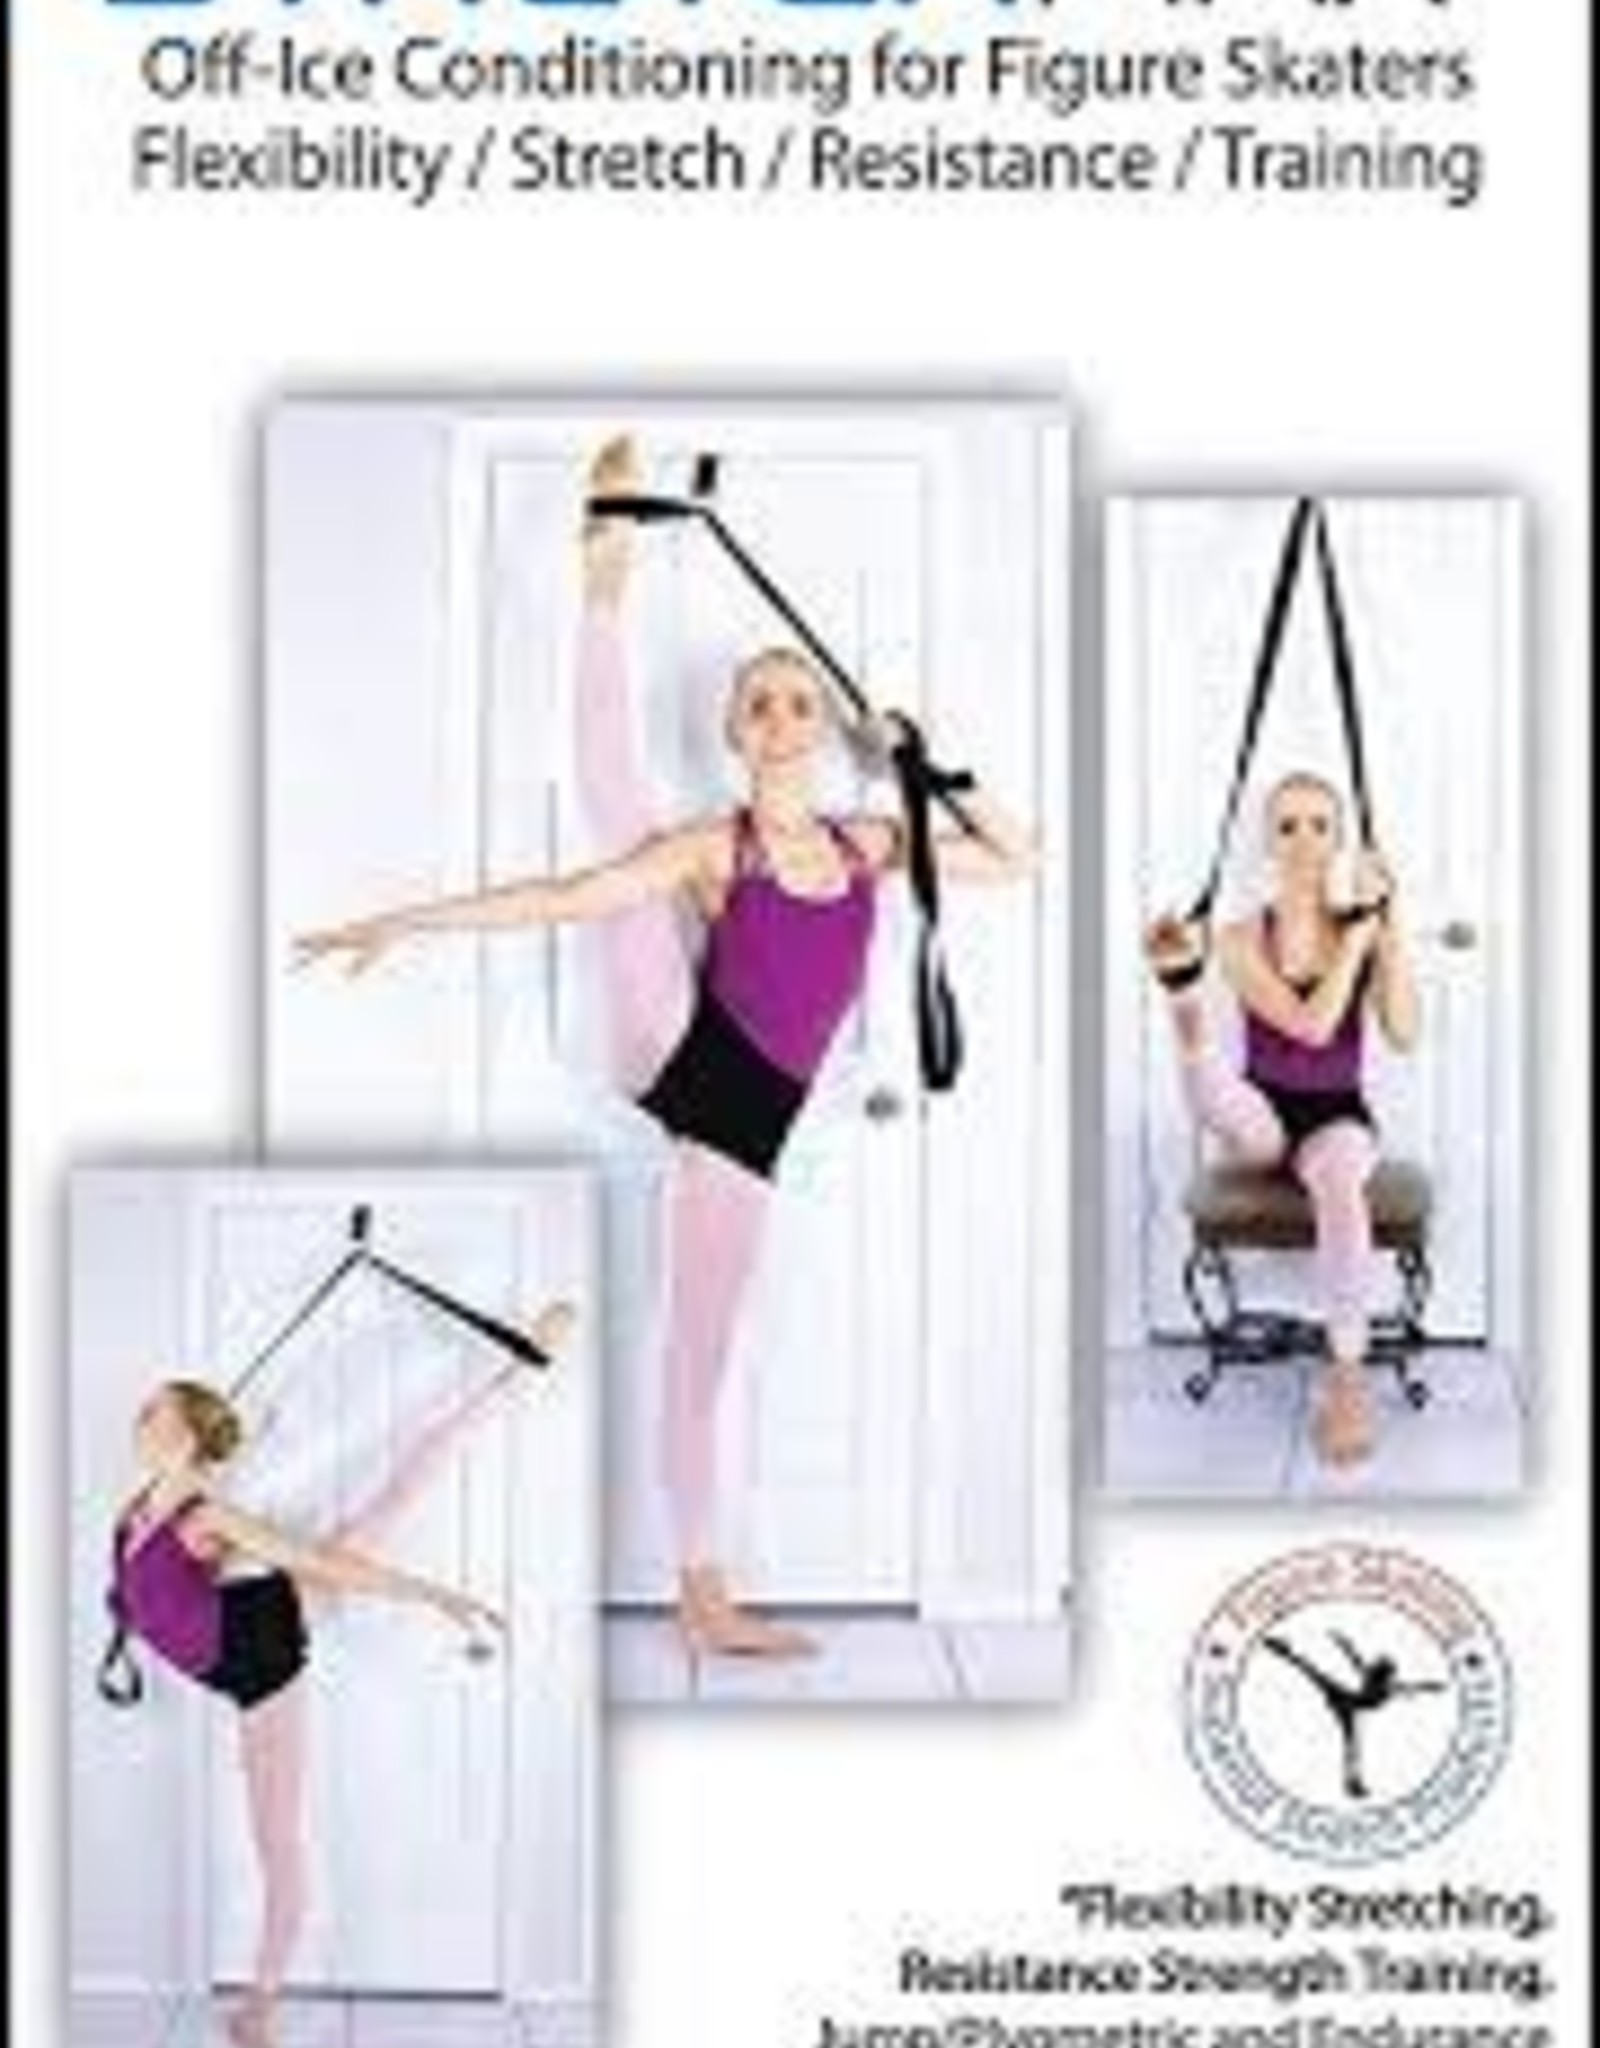 Superior Stretch Superior Stretch StretchMAX